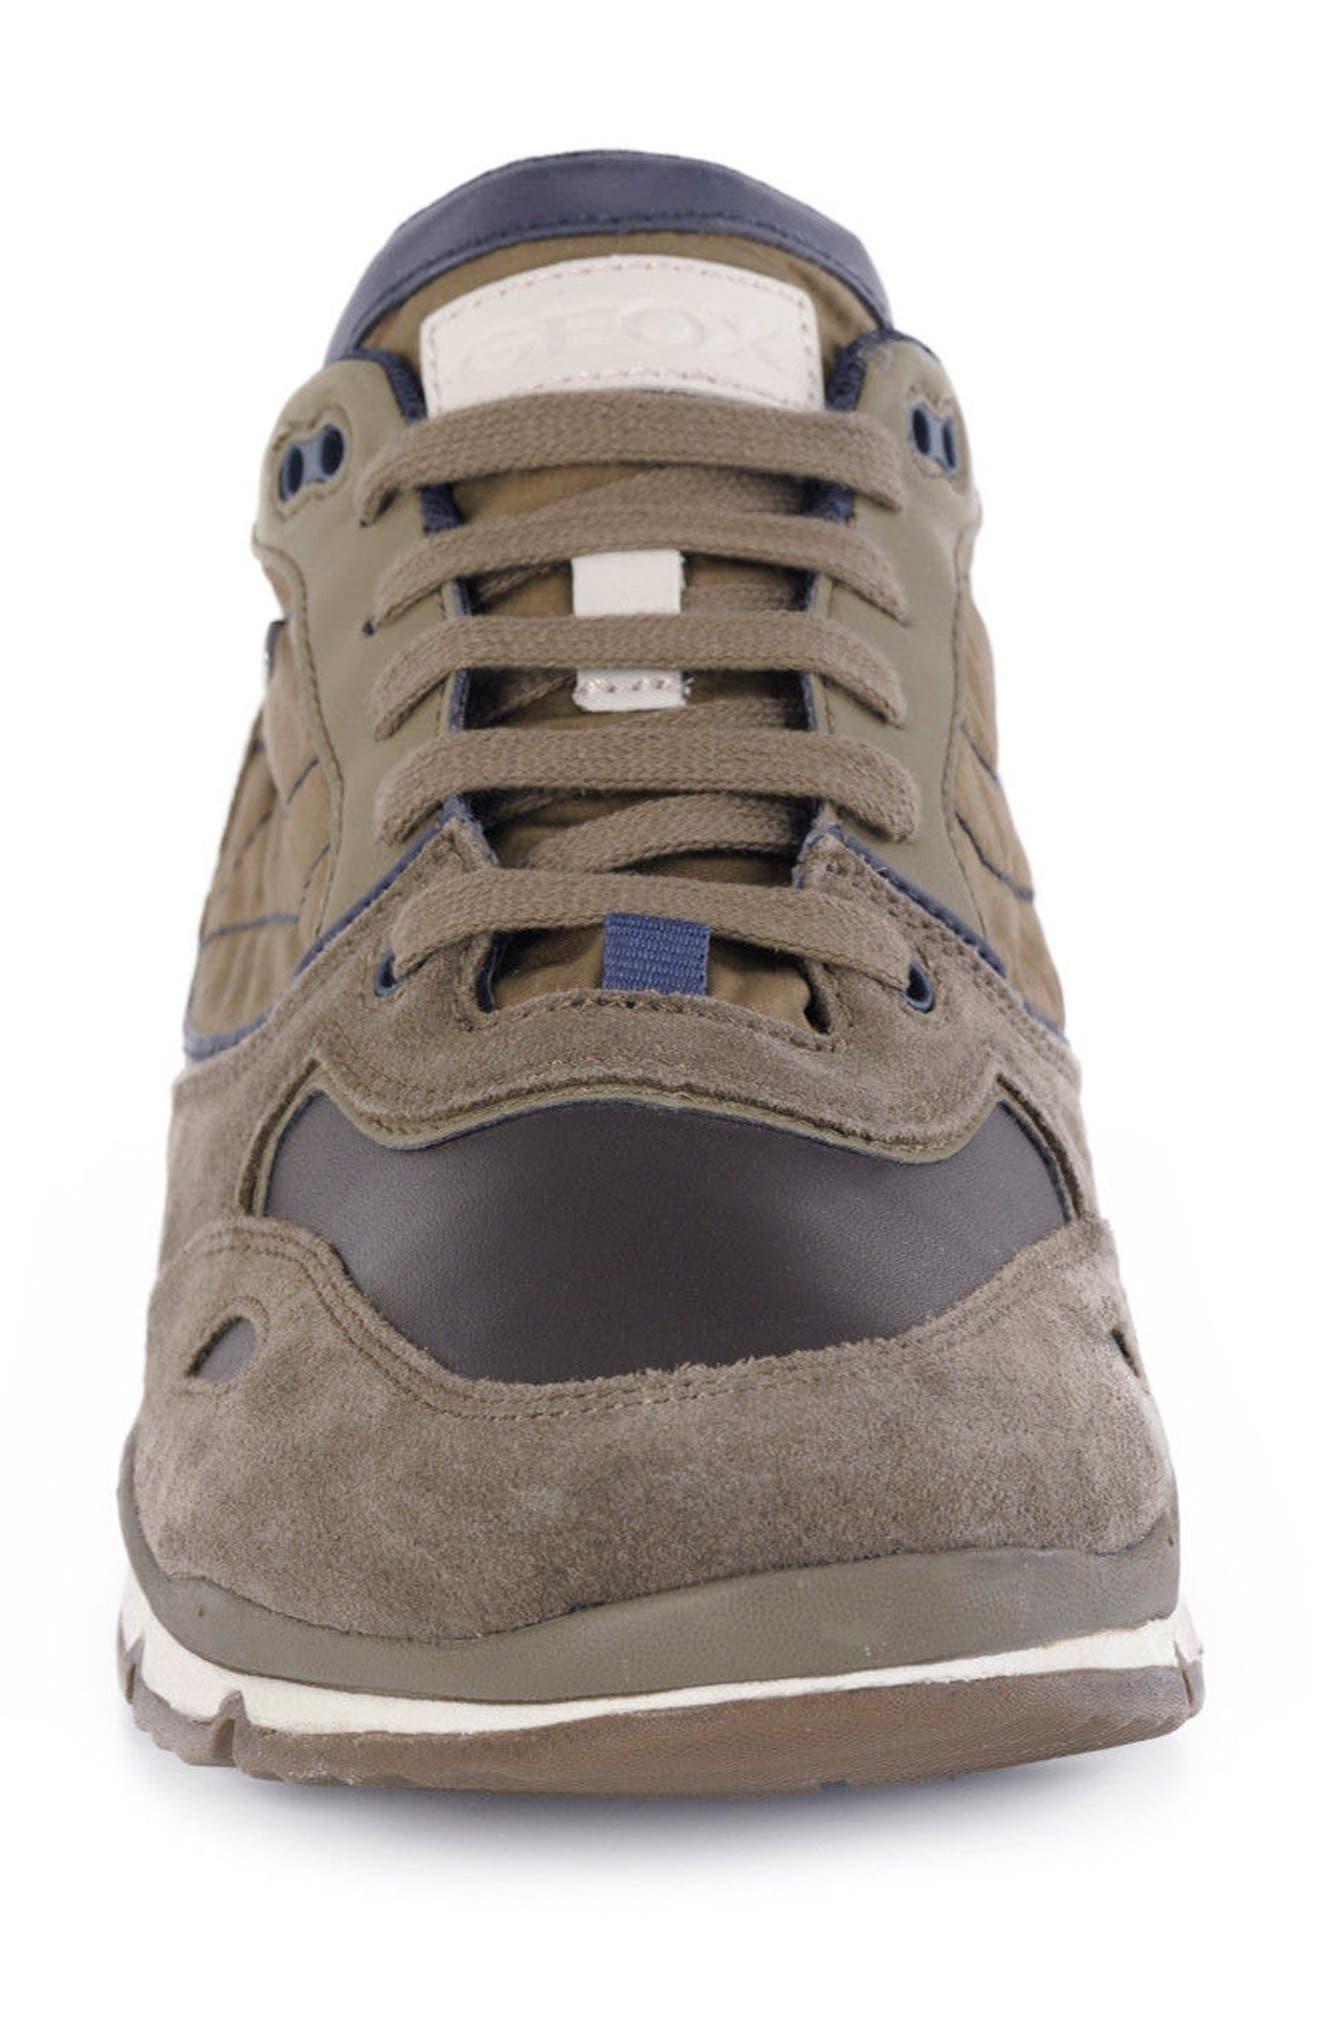 Sandro ABX Ambphibiox Waterproof Sneaker,                             Alternate thumbnail 4, color,                             Taupe